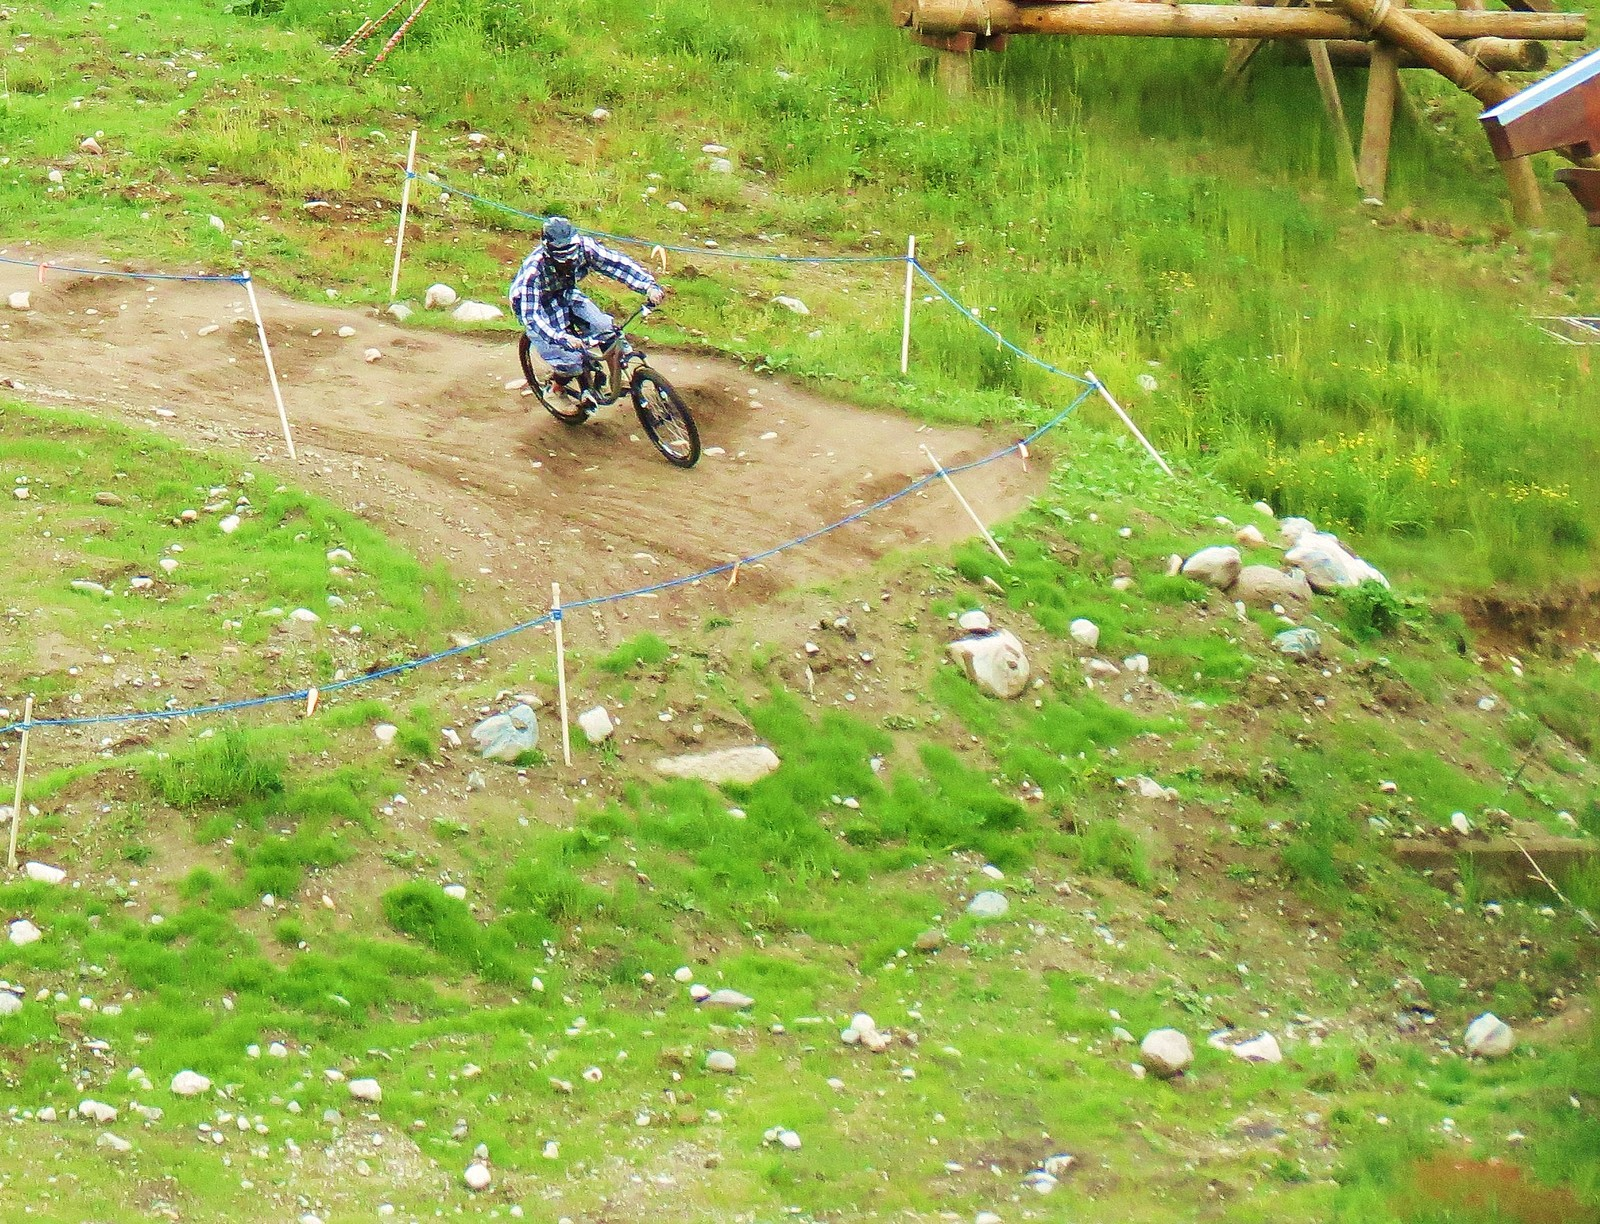 IMG 3483 (3) - Moosey - Mountain Biking Pictures - Vital MTB